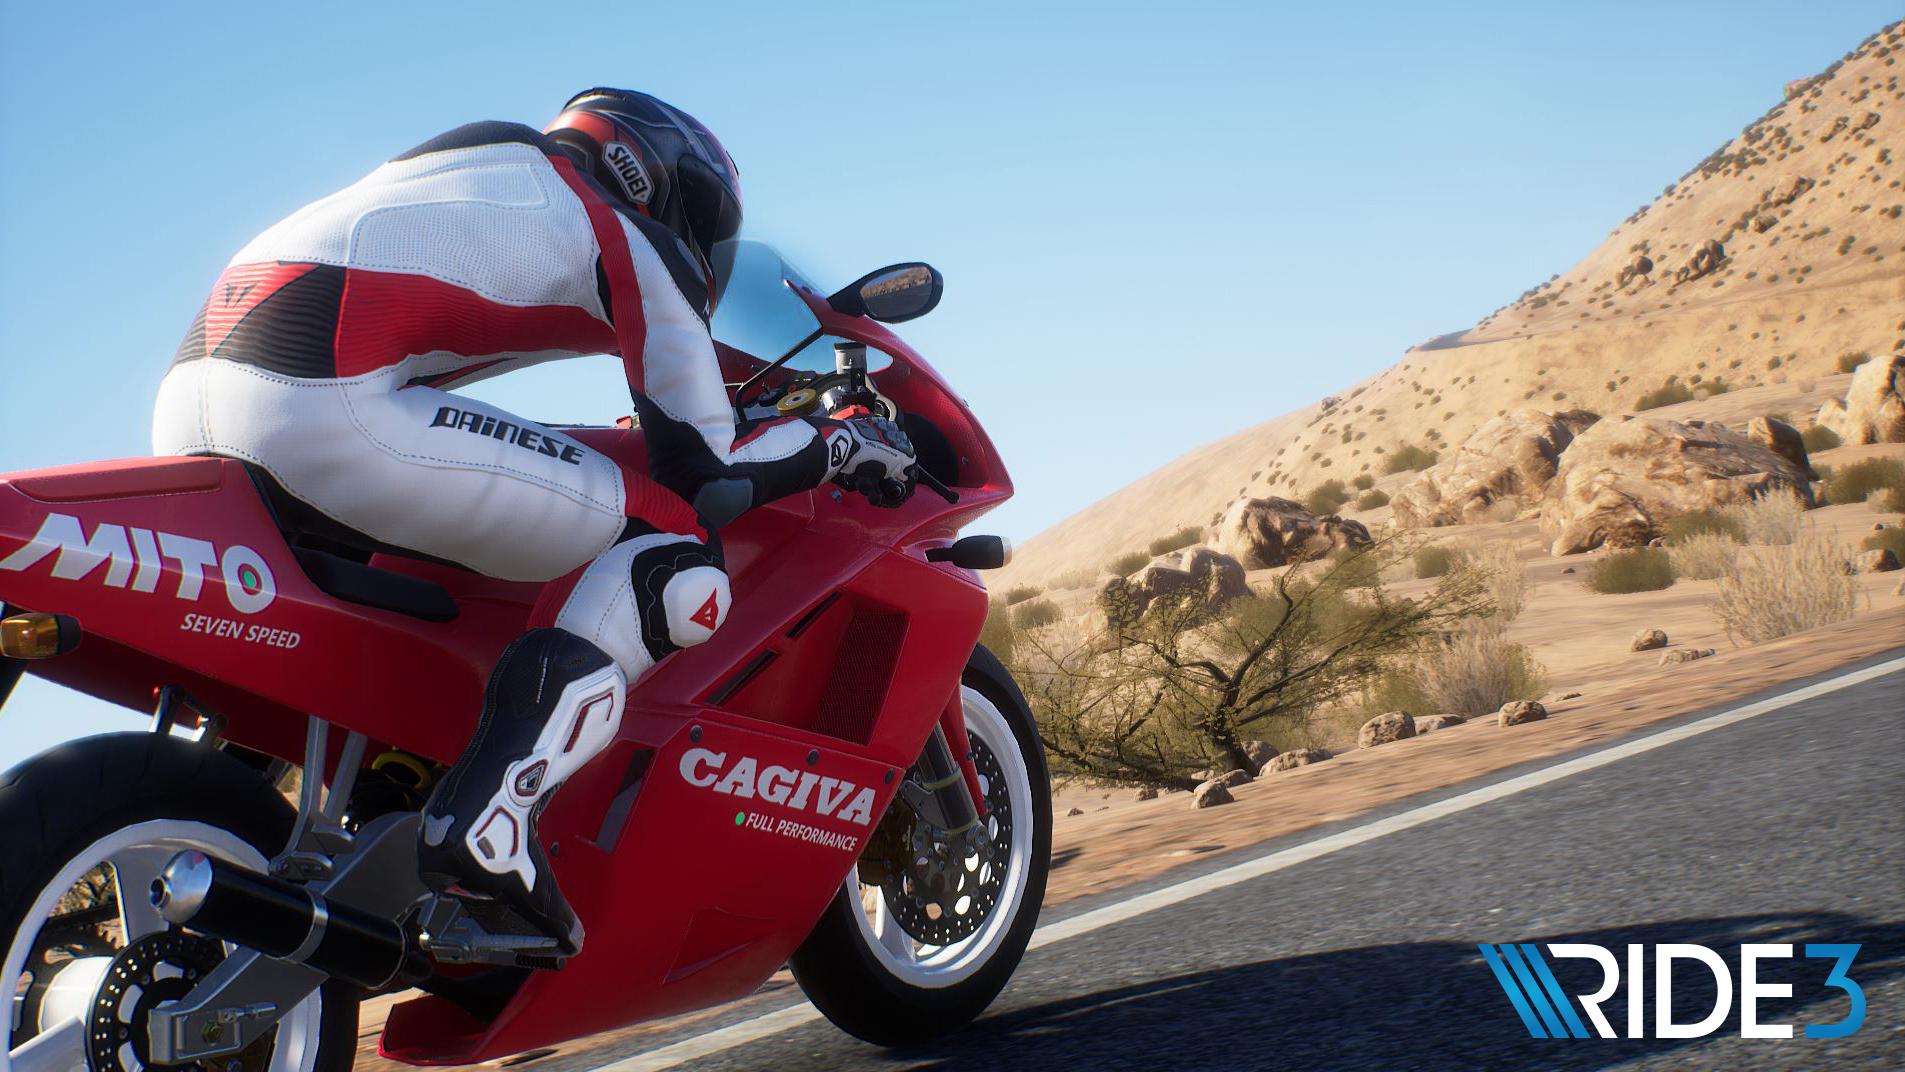 Ride 3 liste des motos1